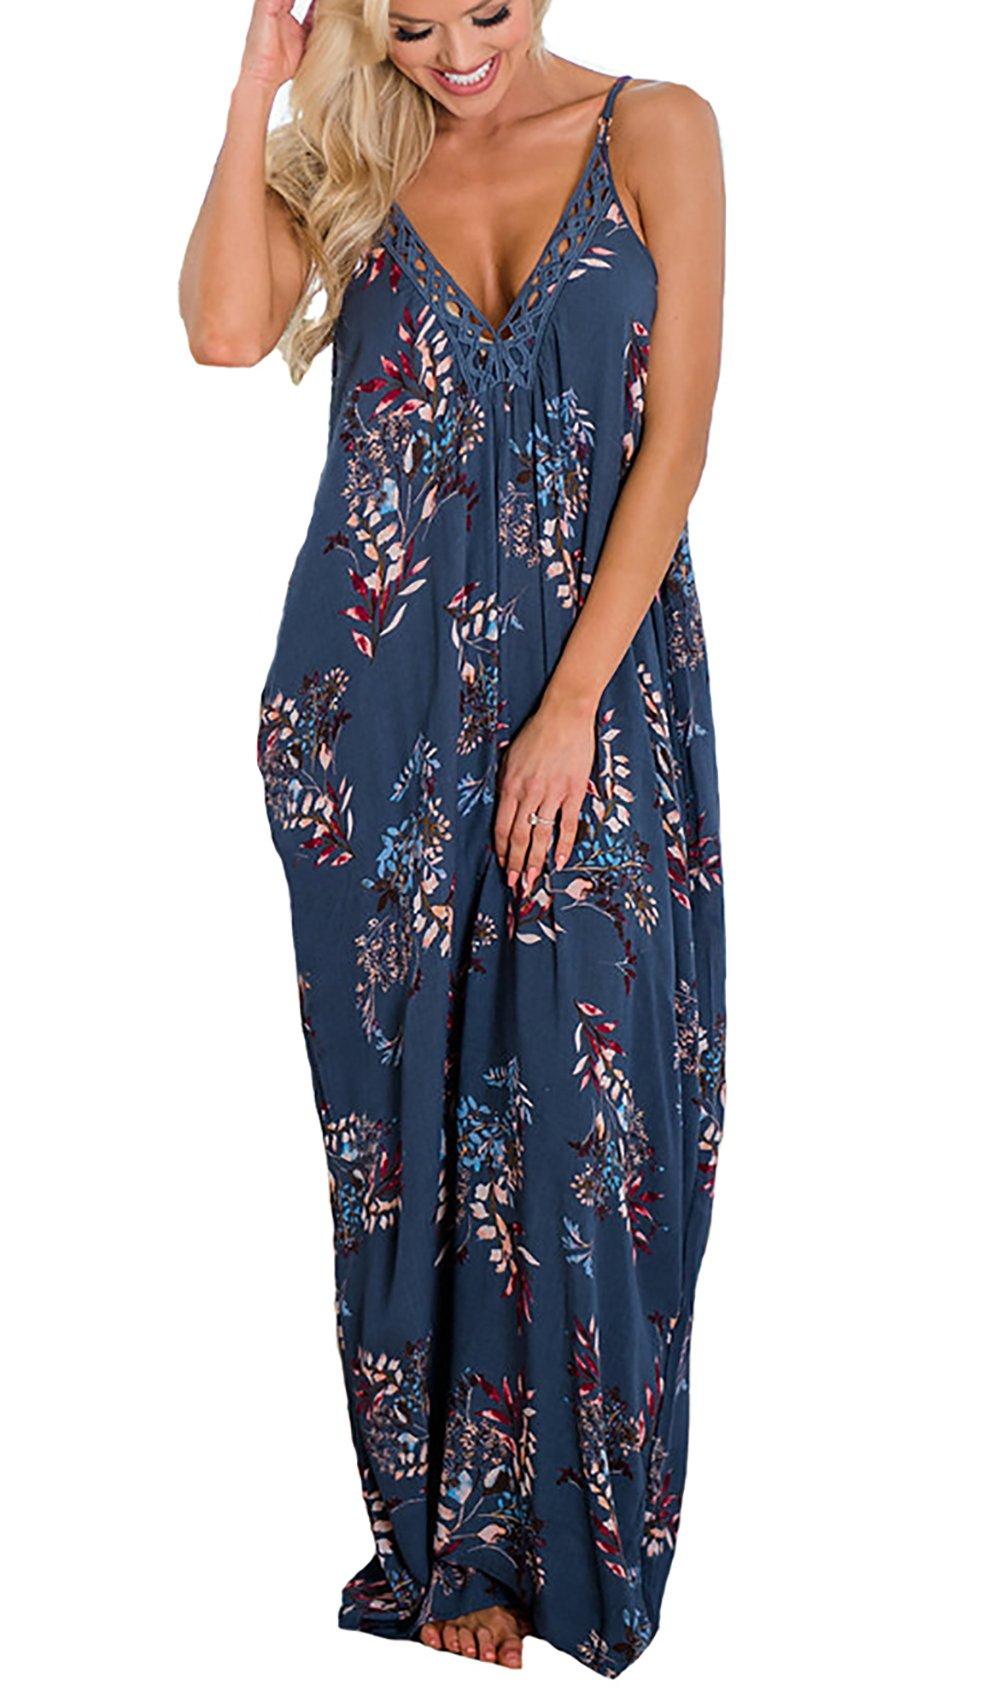 PRETTYGARDEN Women's Spaghetti Strap Floral Print Deep V Neck Boho Maxi Long Flowy Dress with Pocket (Blue, X-Large)